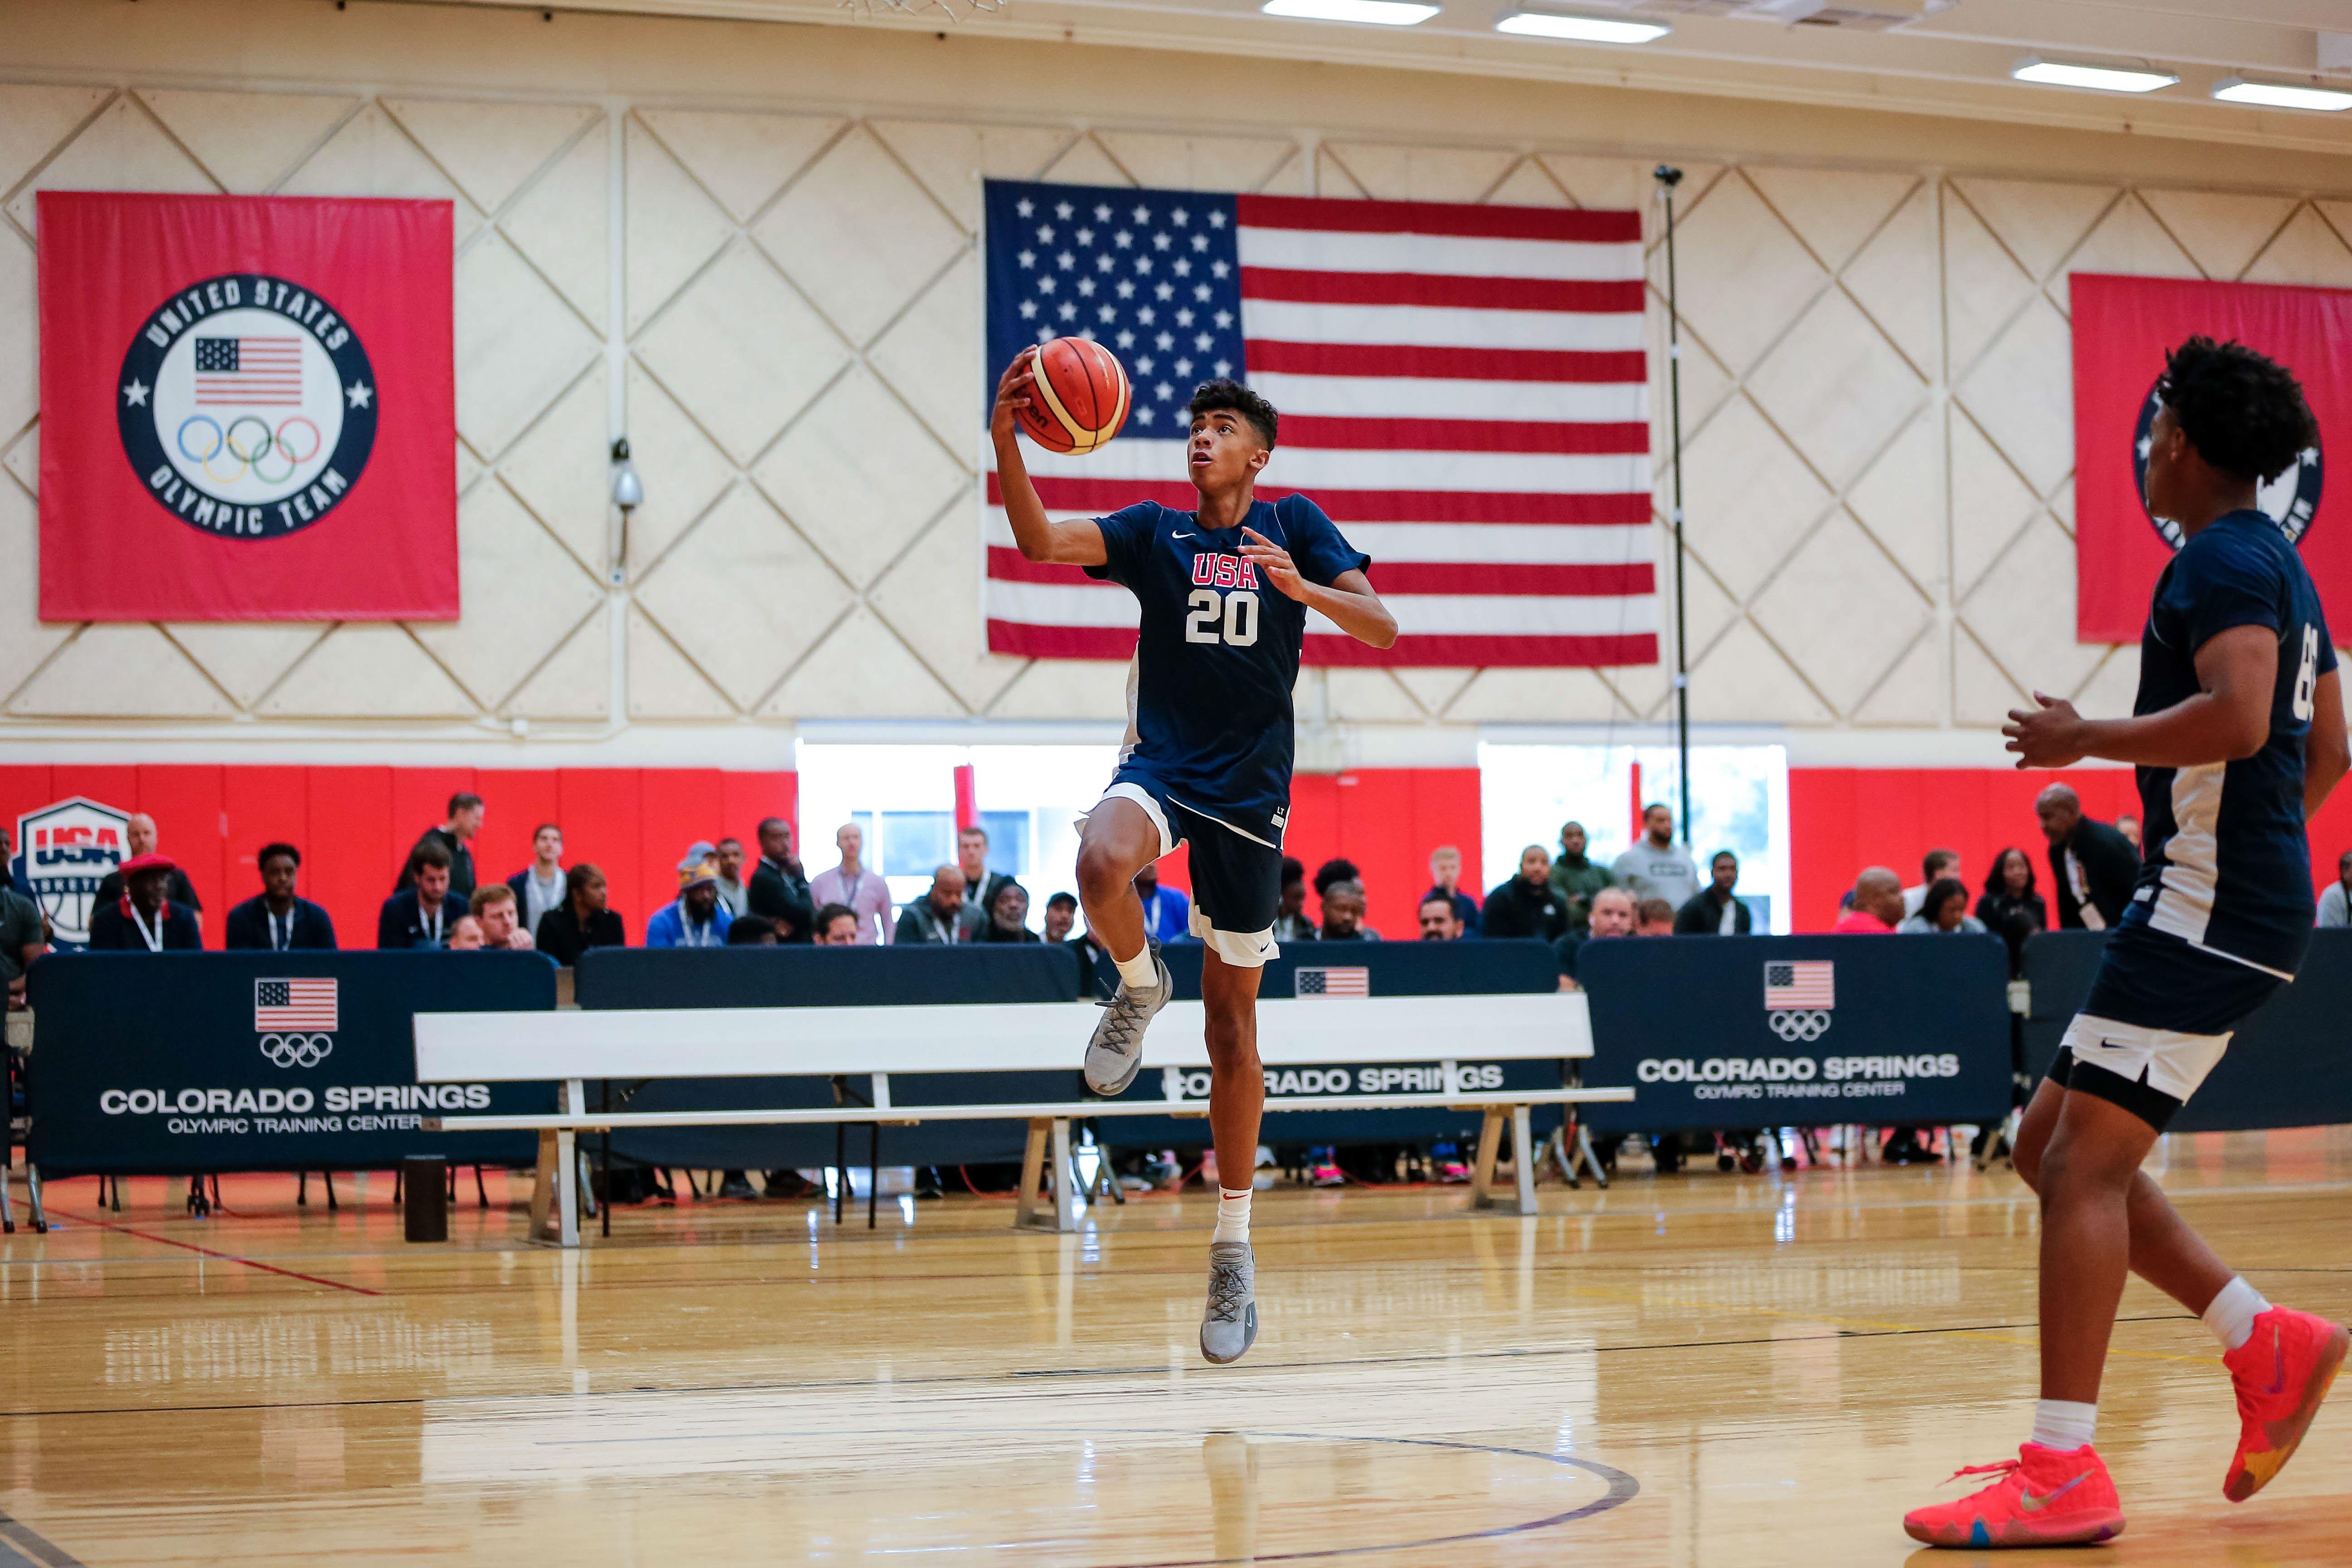 Michigan State Basketball Lands 5 Star Guard Max Christie For 2021 Recruiting Class In 2020 Michigan State Basketball Michigan State Michigan